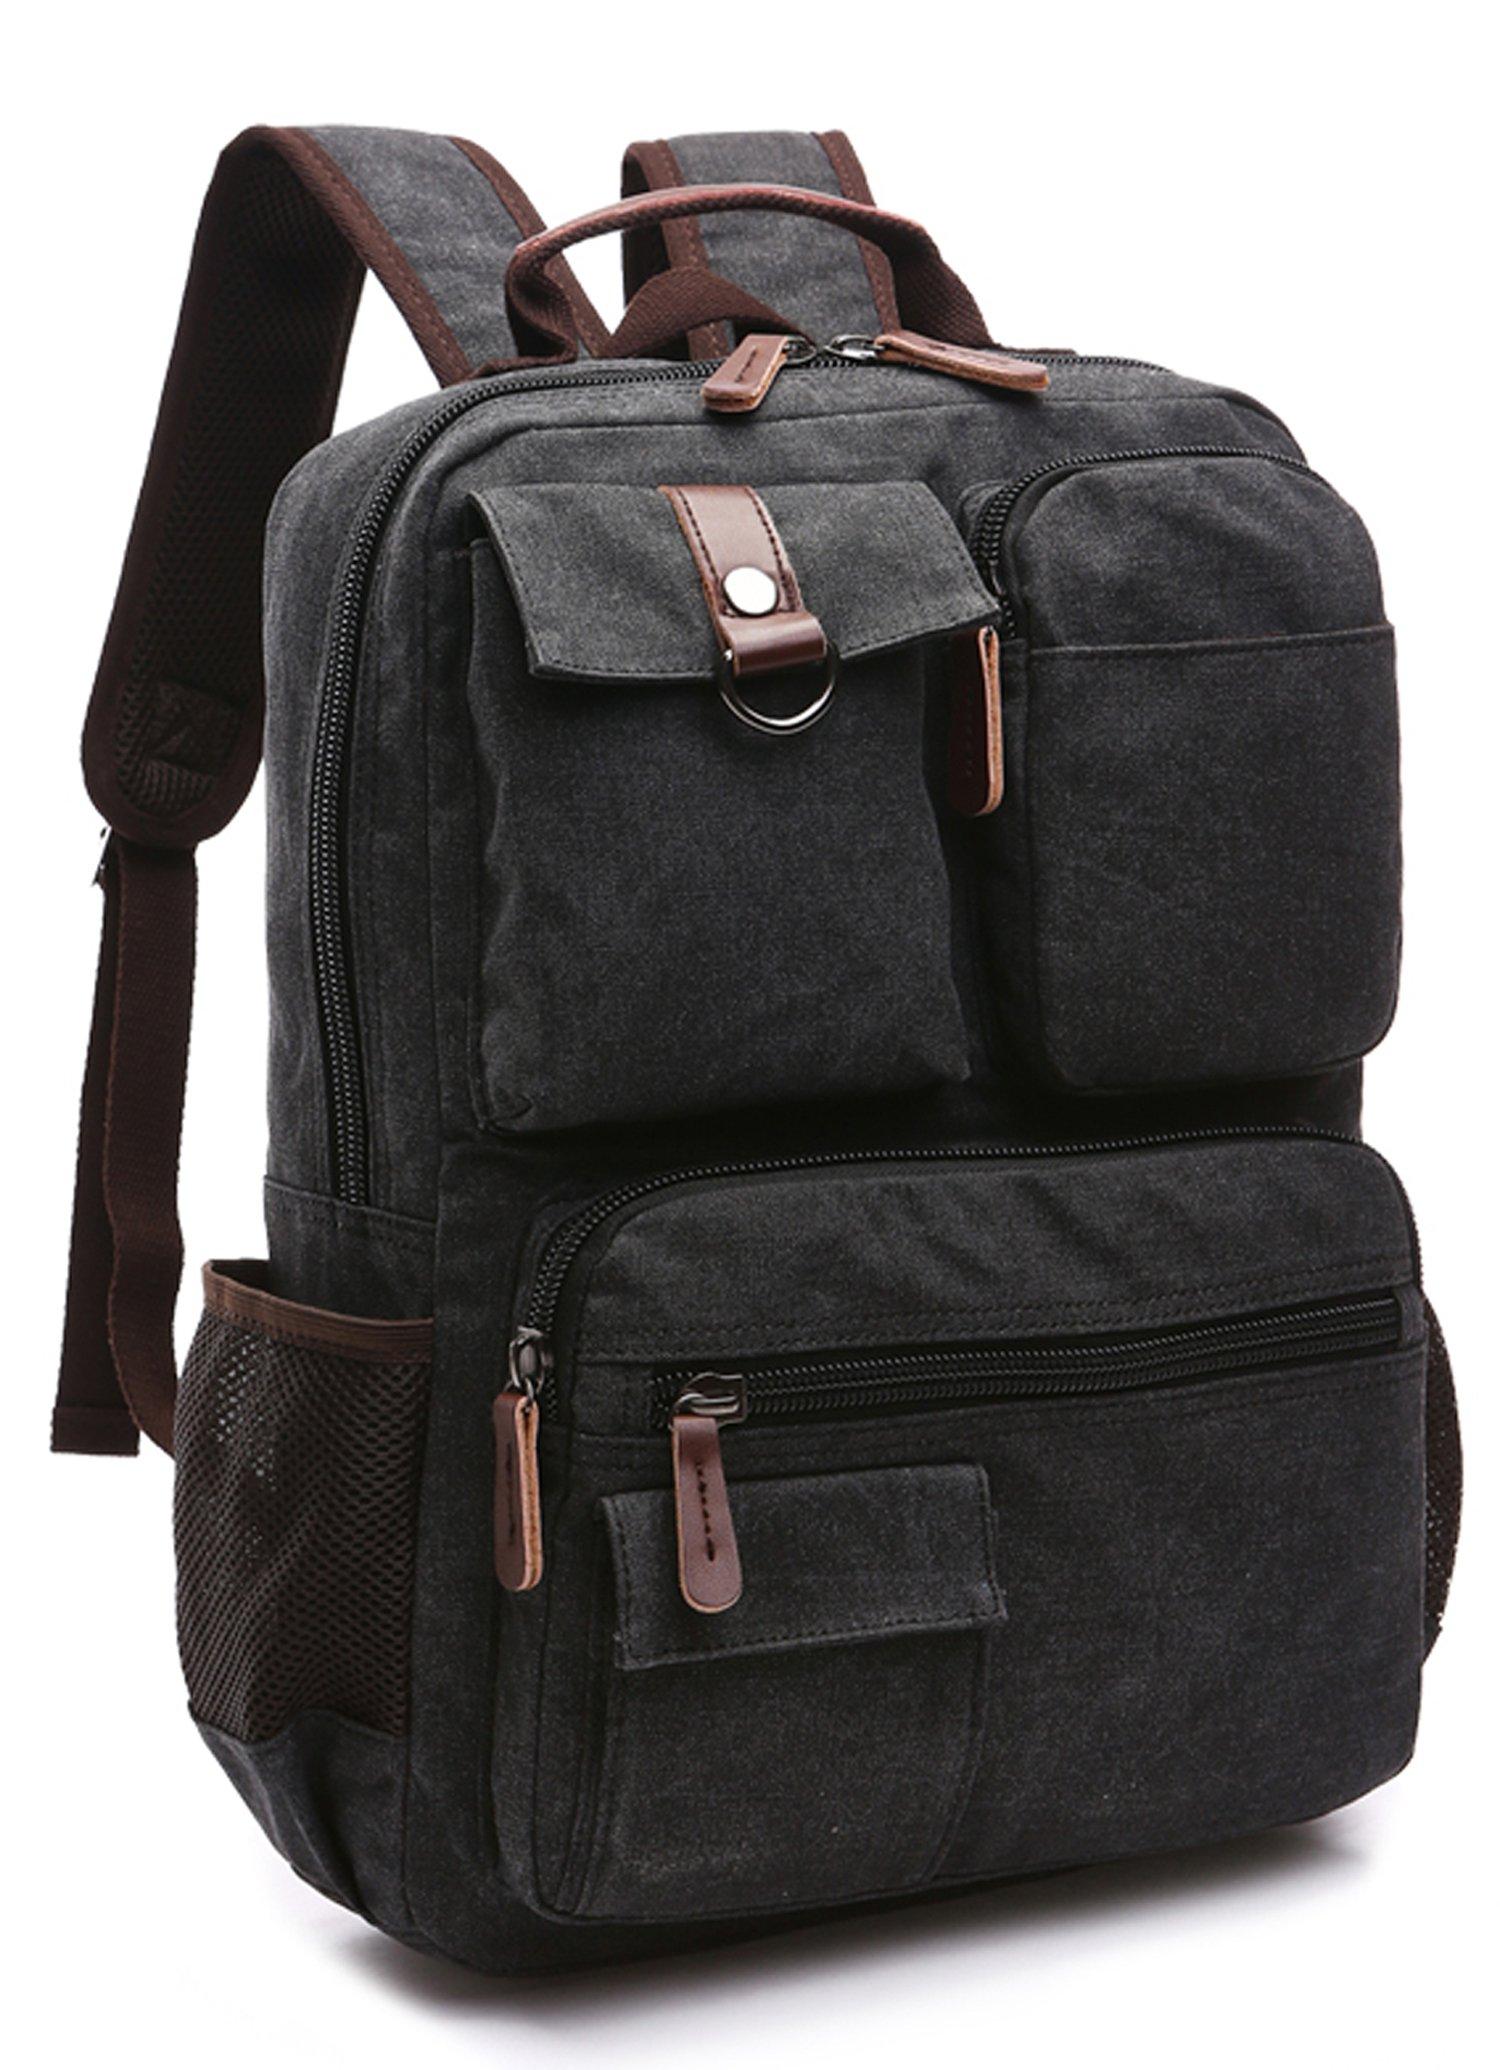 Canvas Backpack, Aidonger Vintage Canvas School Backpack Hiking Travel Rucksack Fits 14'' Laptop (Black-48)